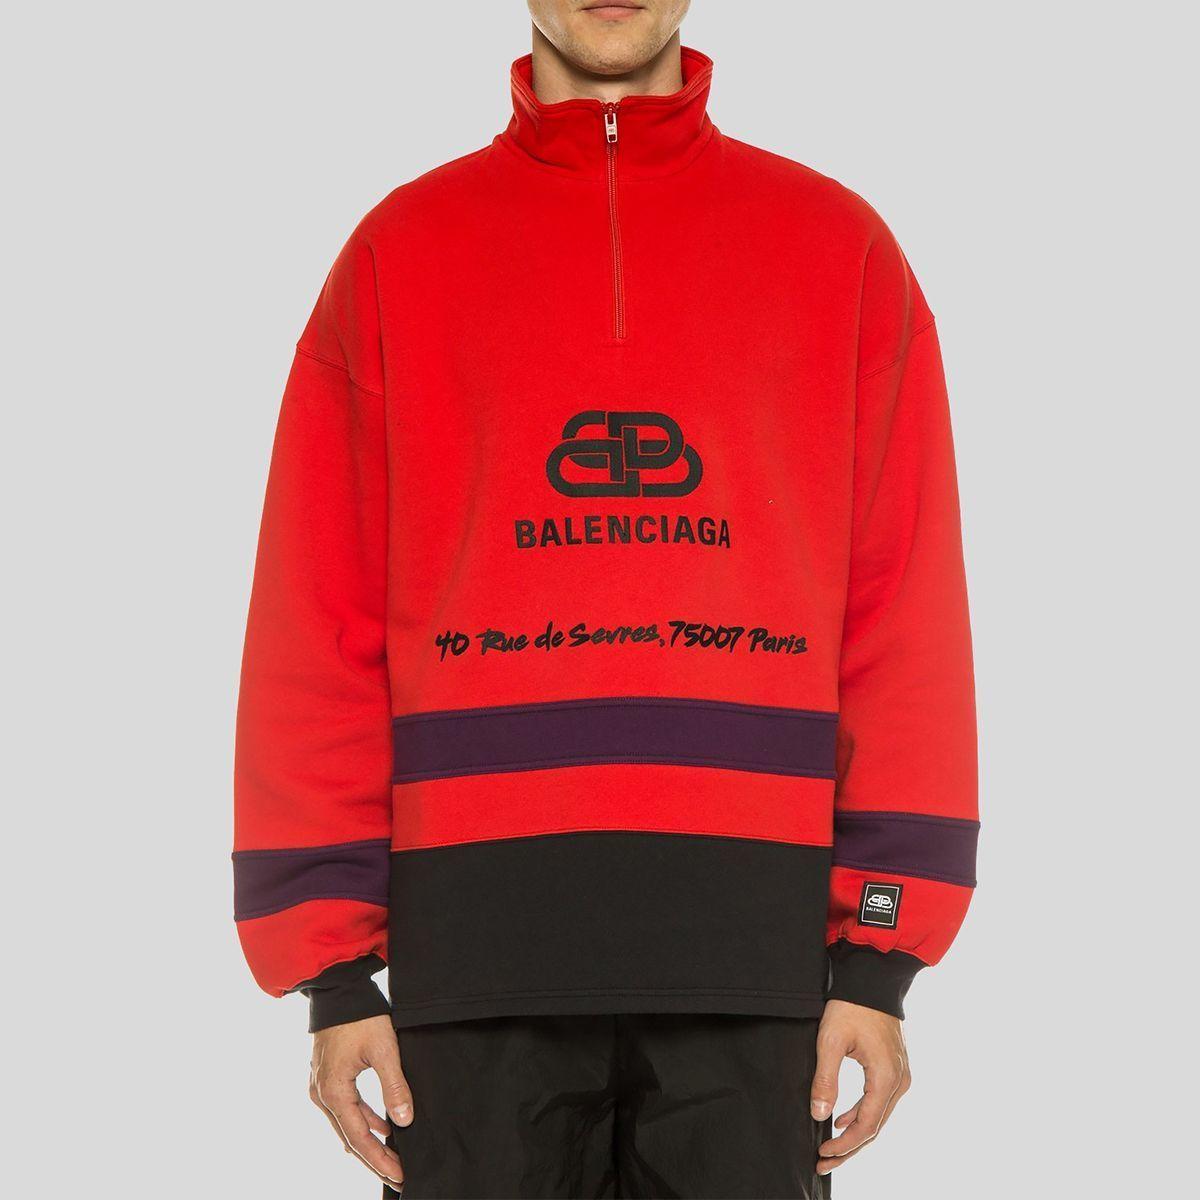 Balenciaga バレンシアガ レッドスキーセーター ウィズ ロゴRed Ski Sweater With Logo